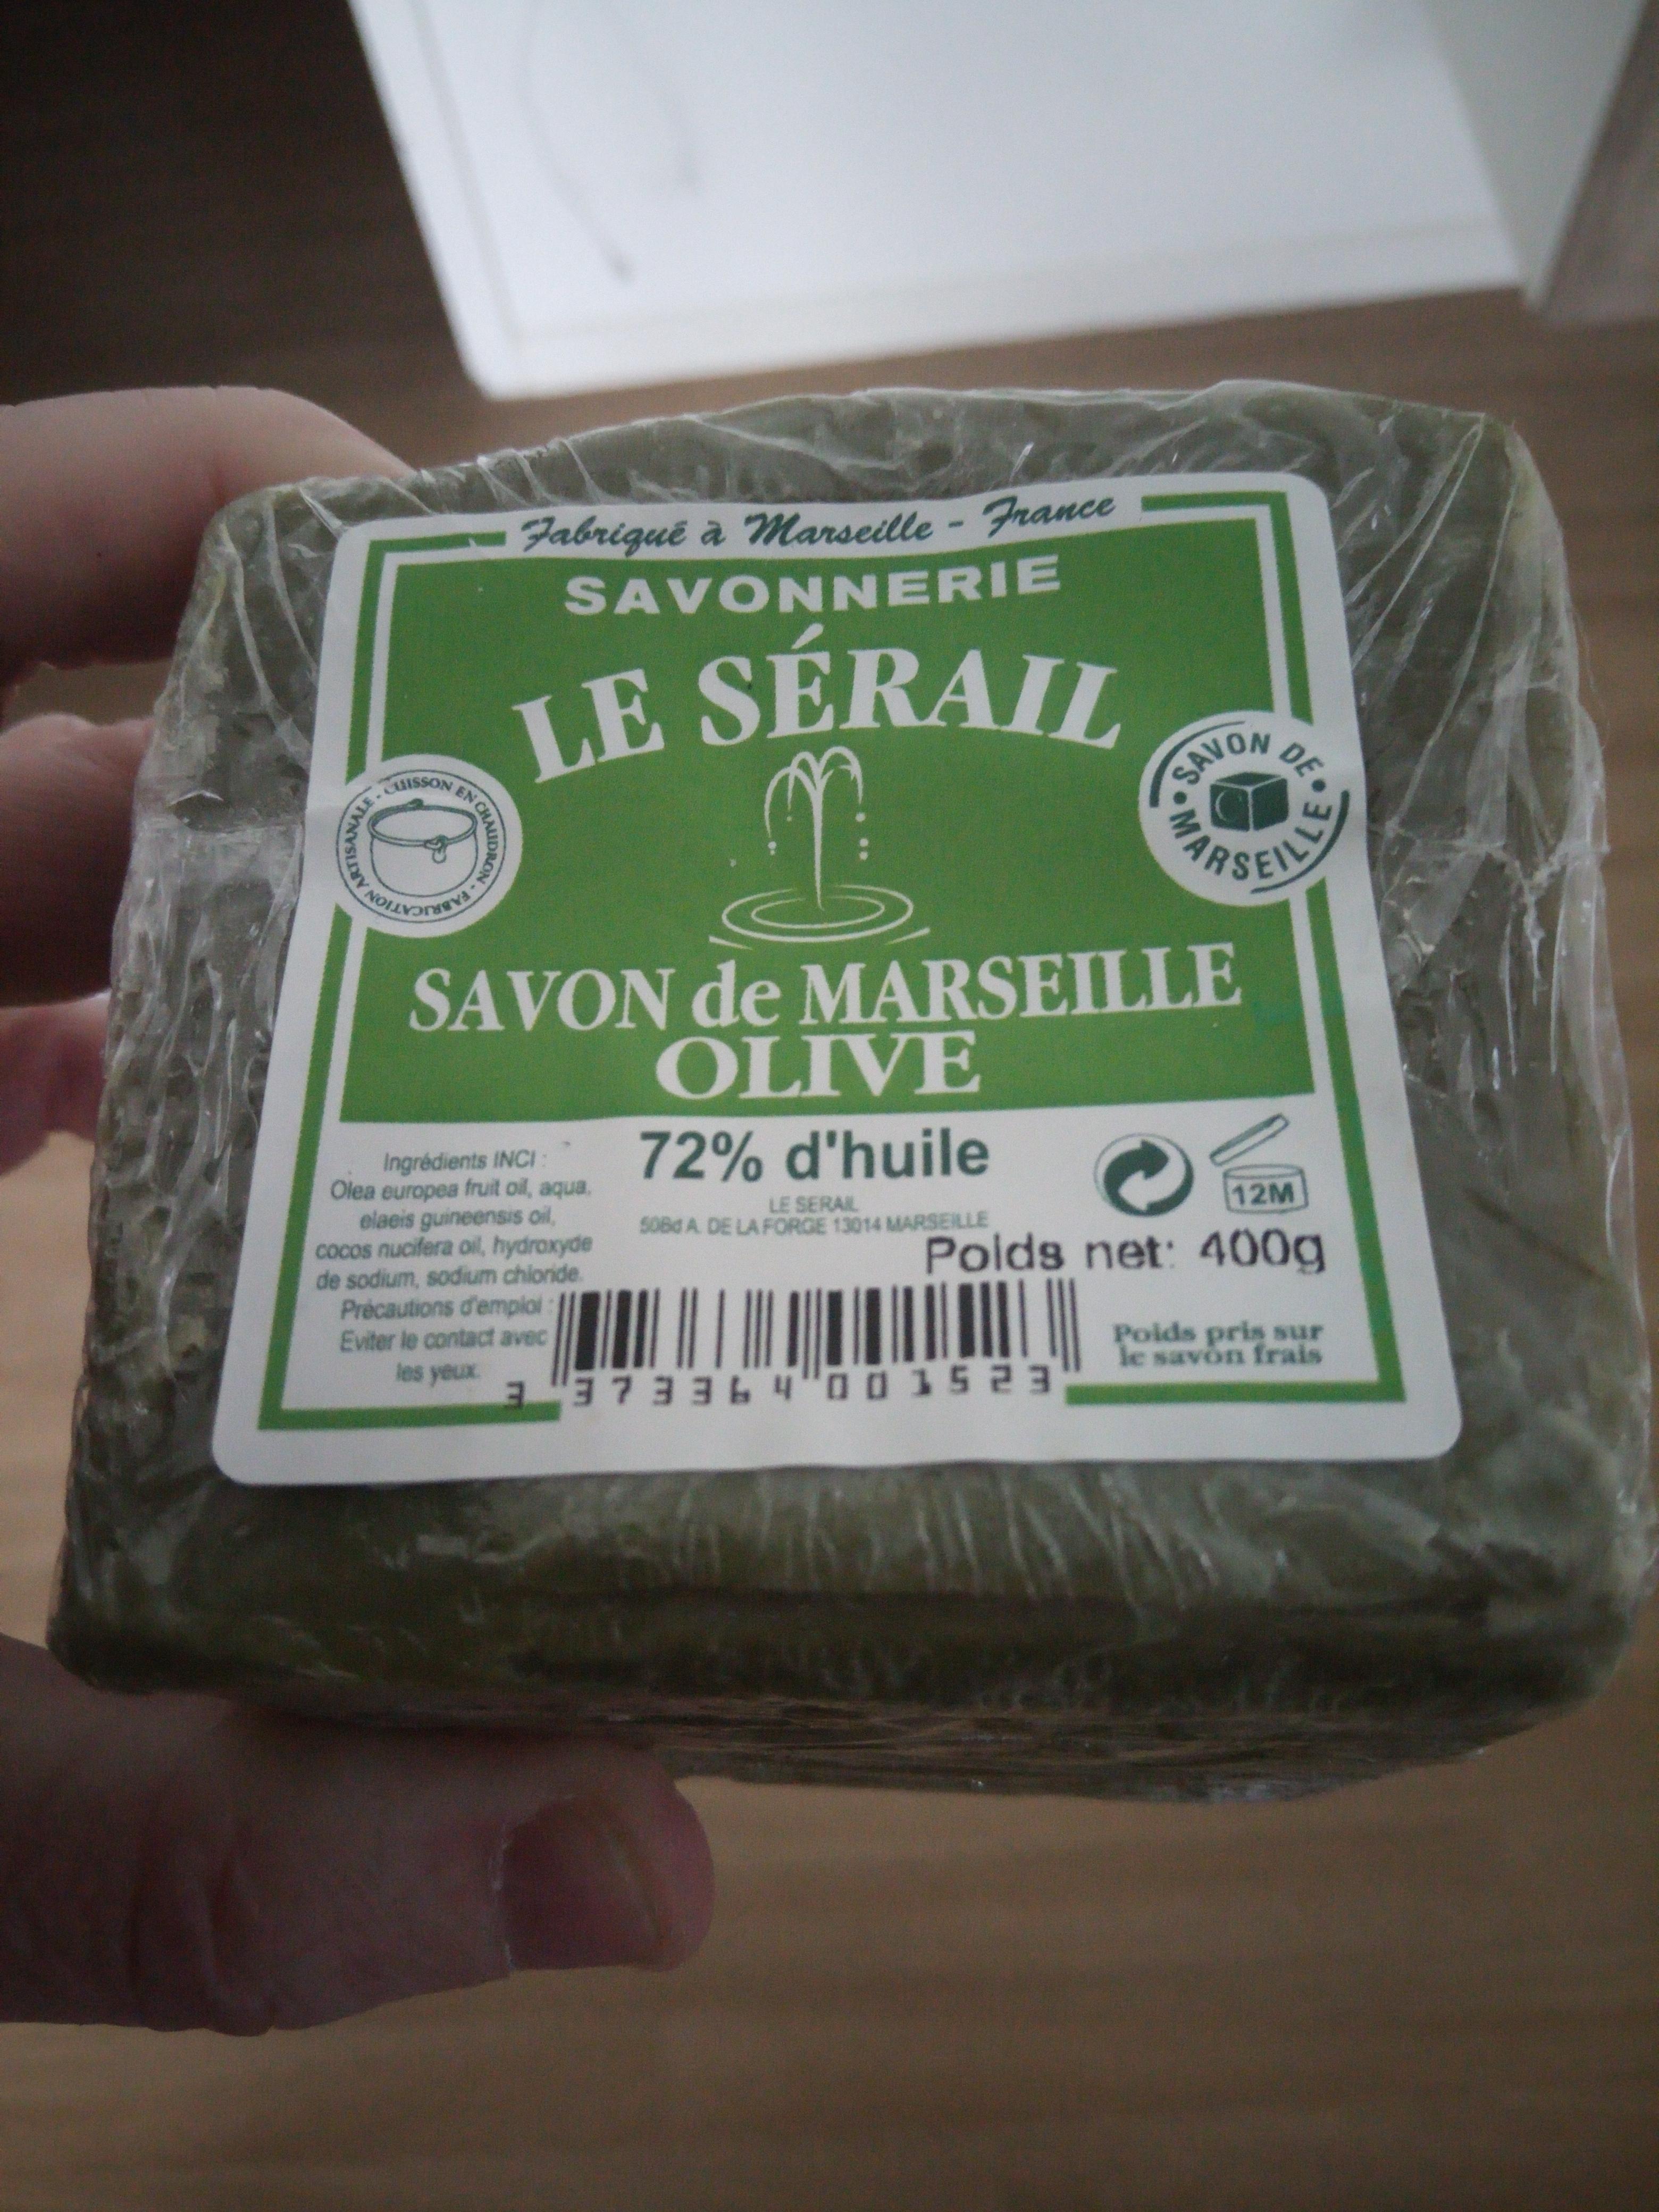 Savon Marseille Serail olive - 72% d'huile (400gr) - Roncq (59)